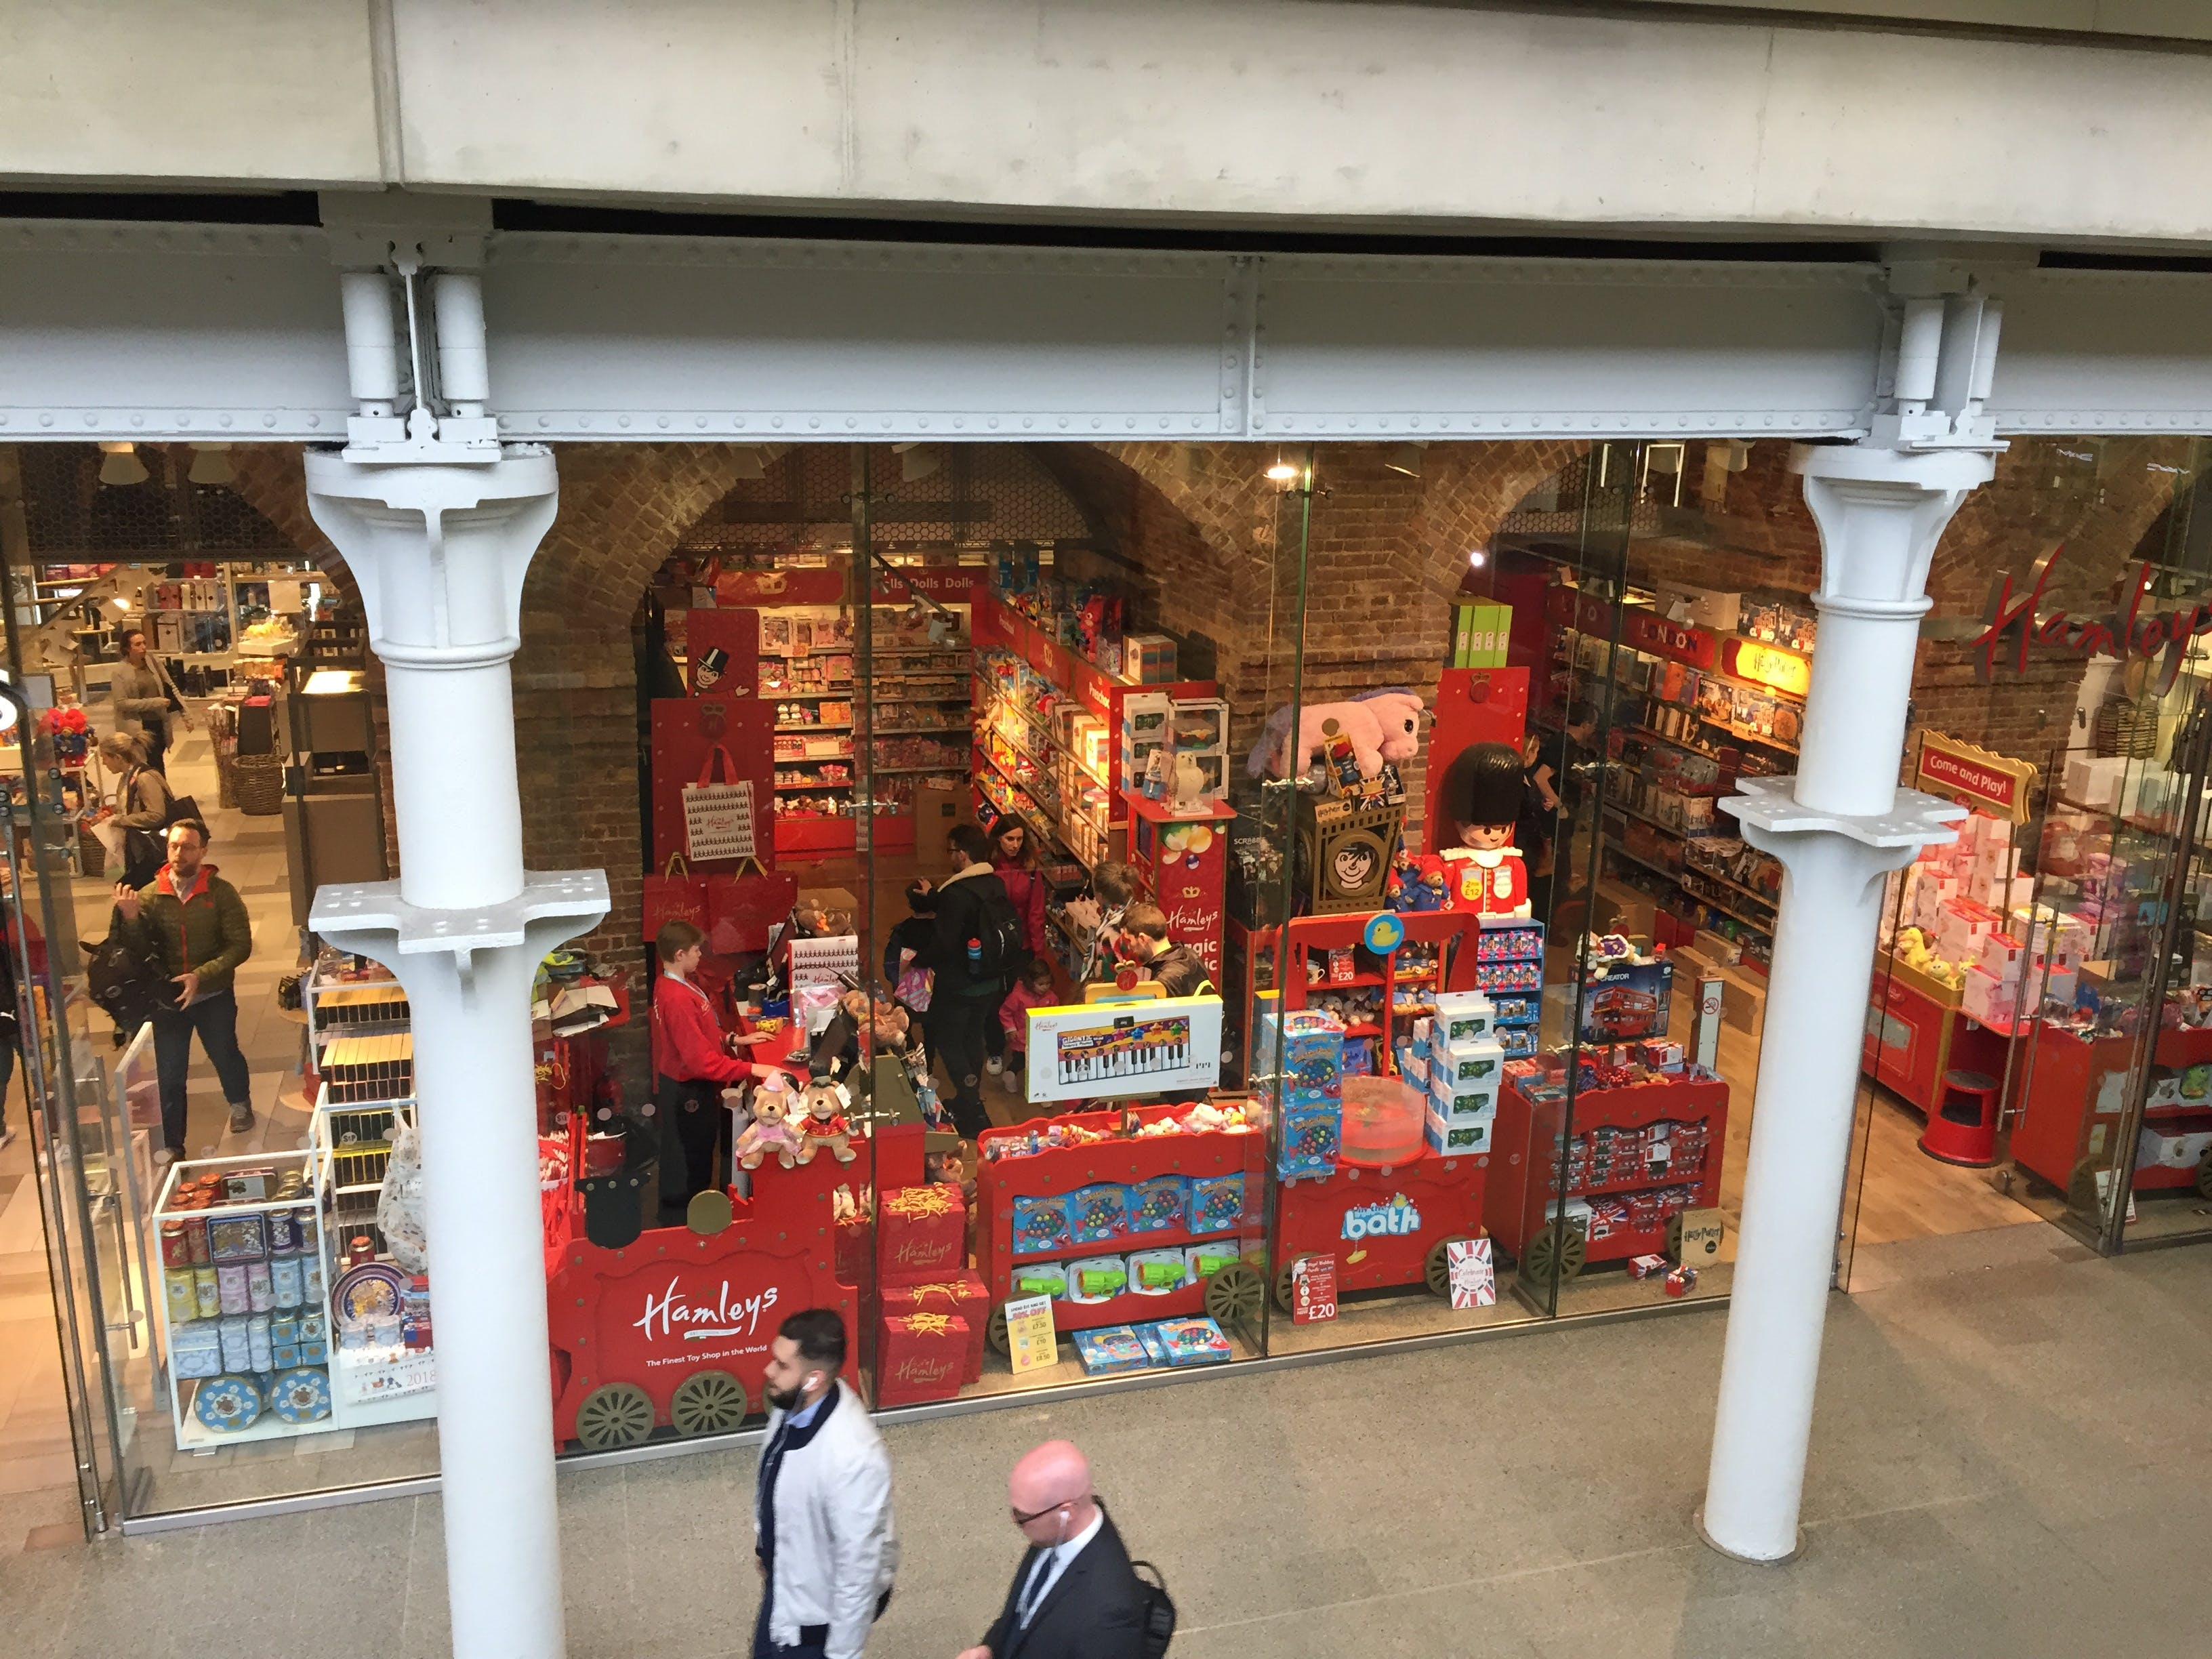 Free stock photo of Eurostar, hamleys, shops, St Pancras International Station